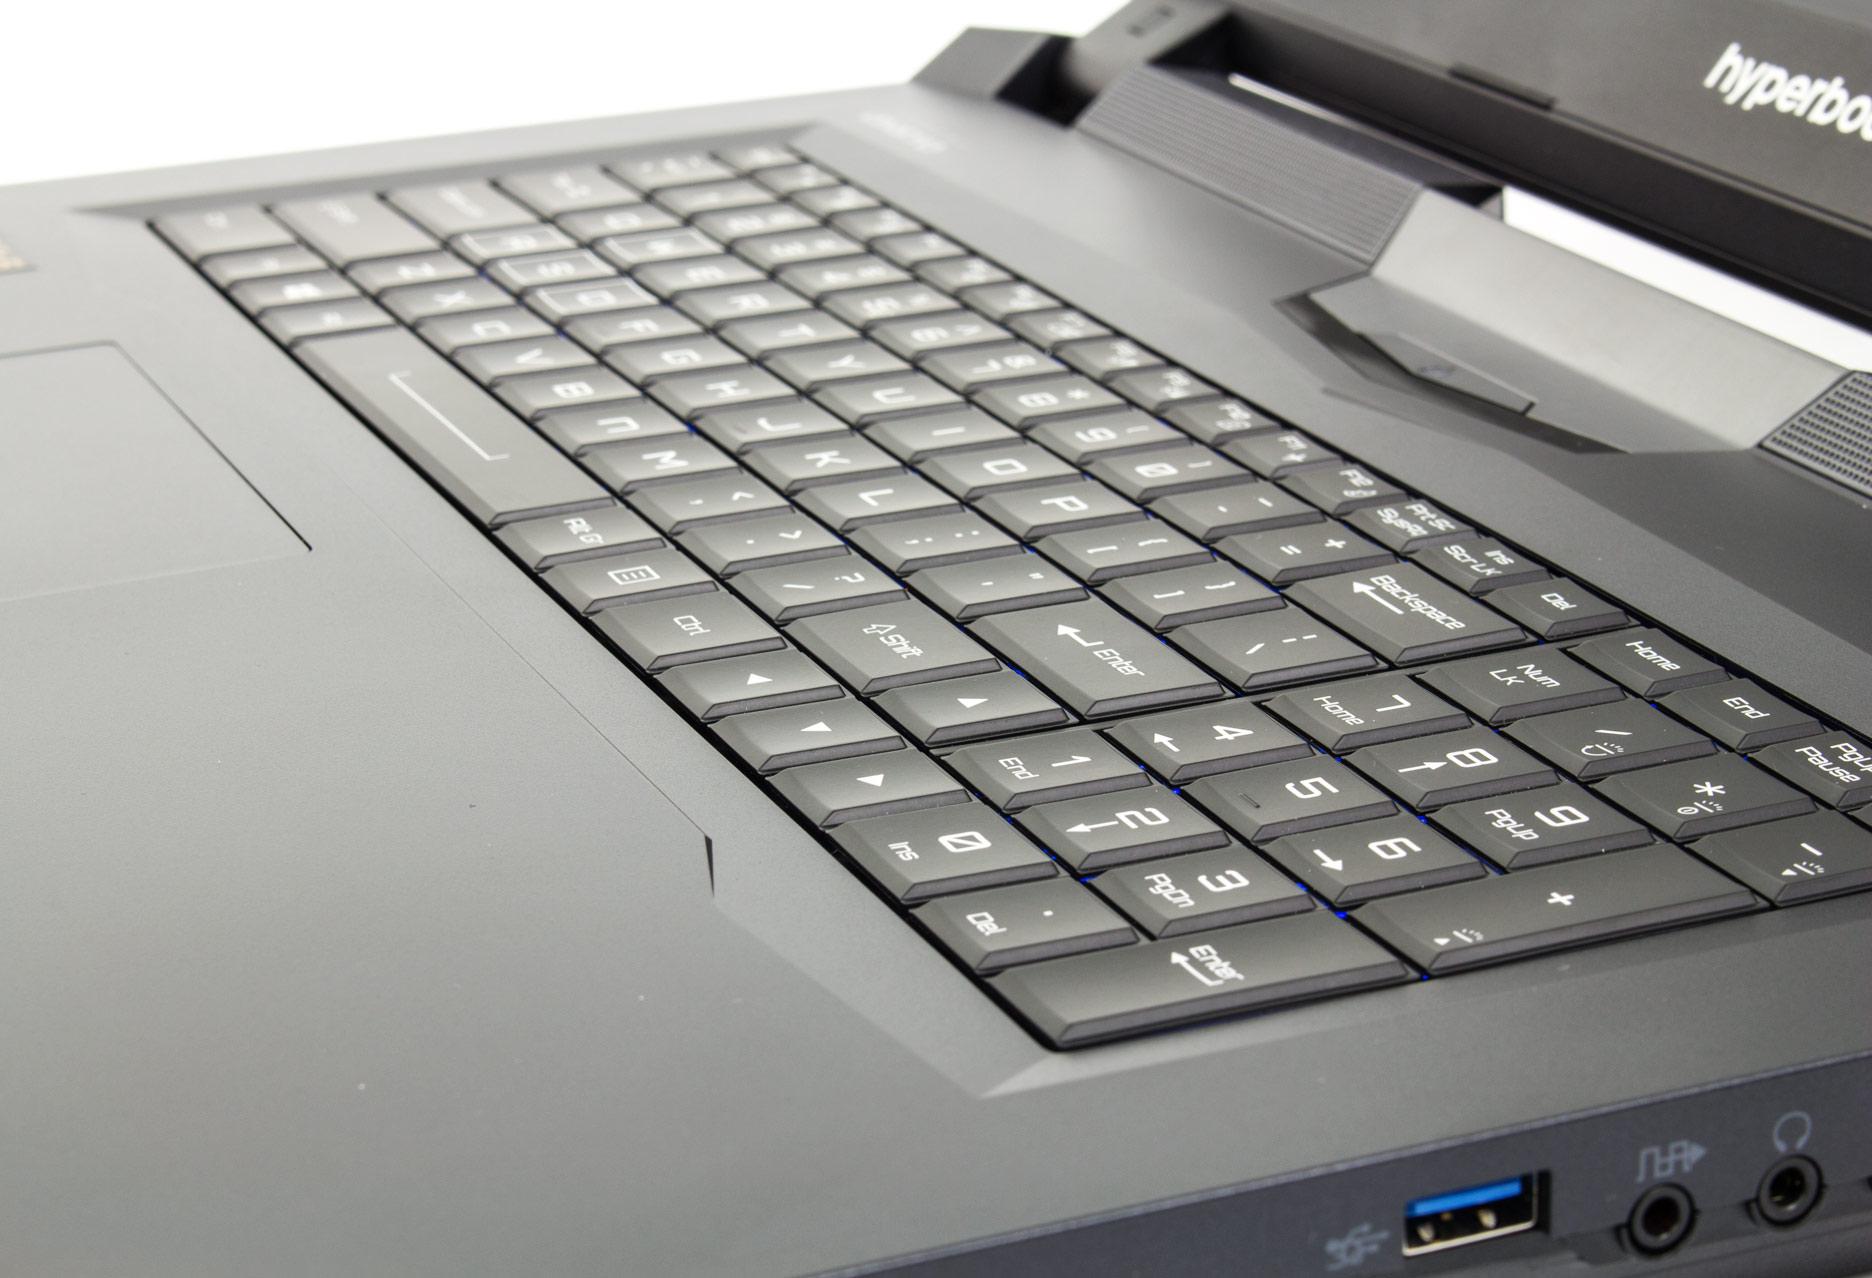 Hyperbook X77DM-G klawiatura